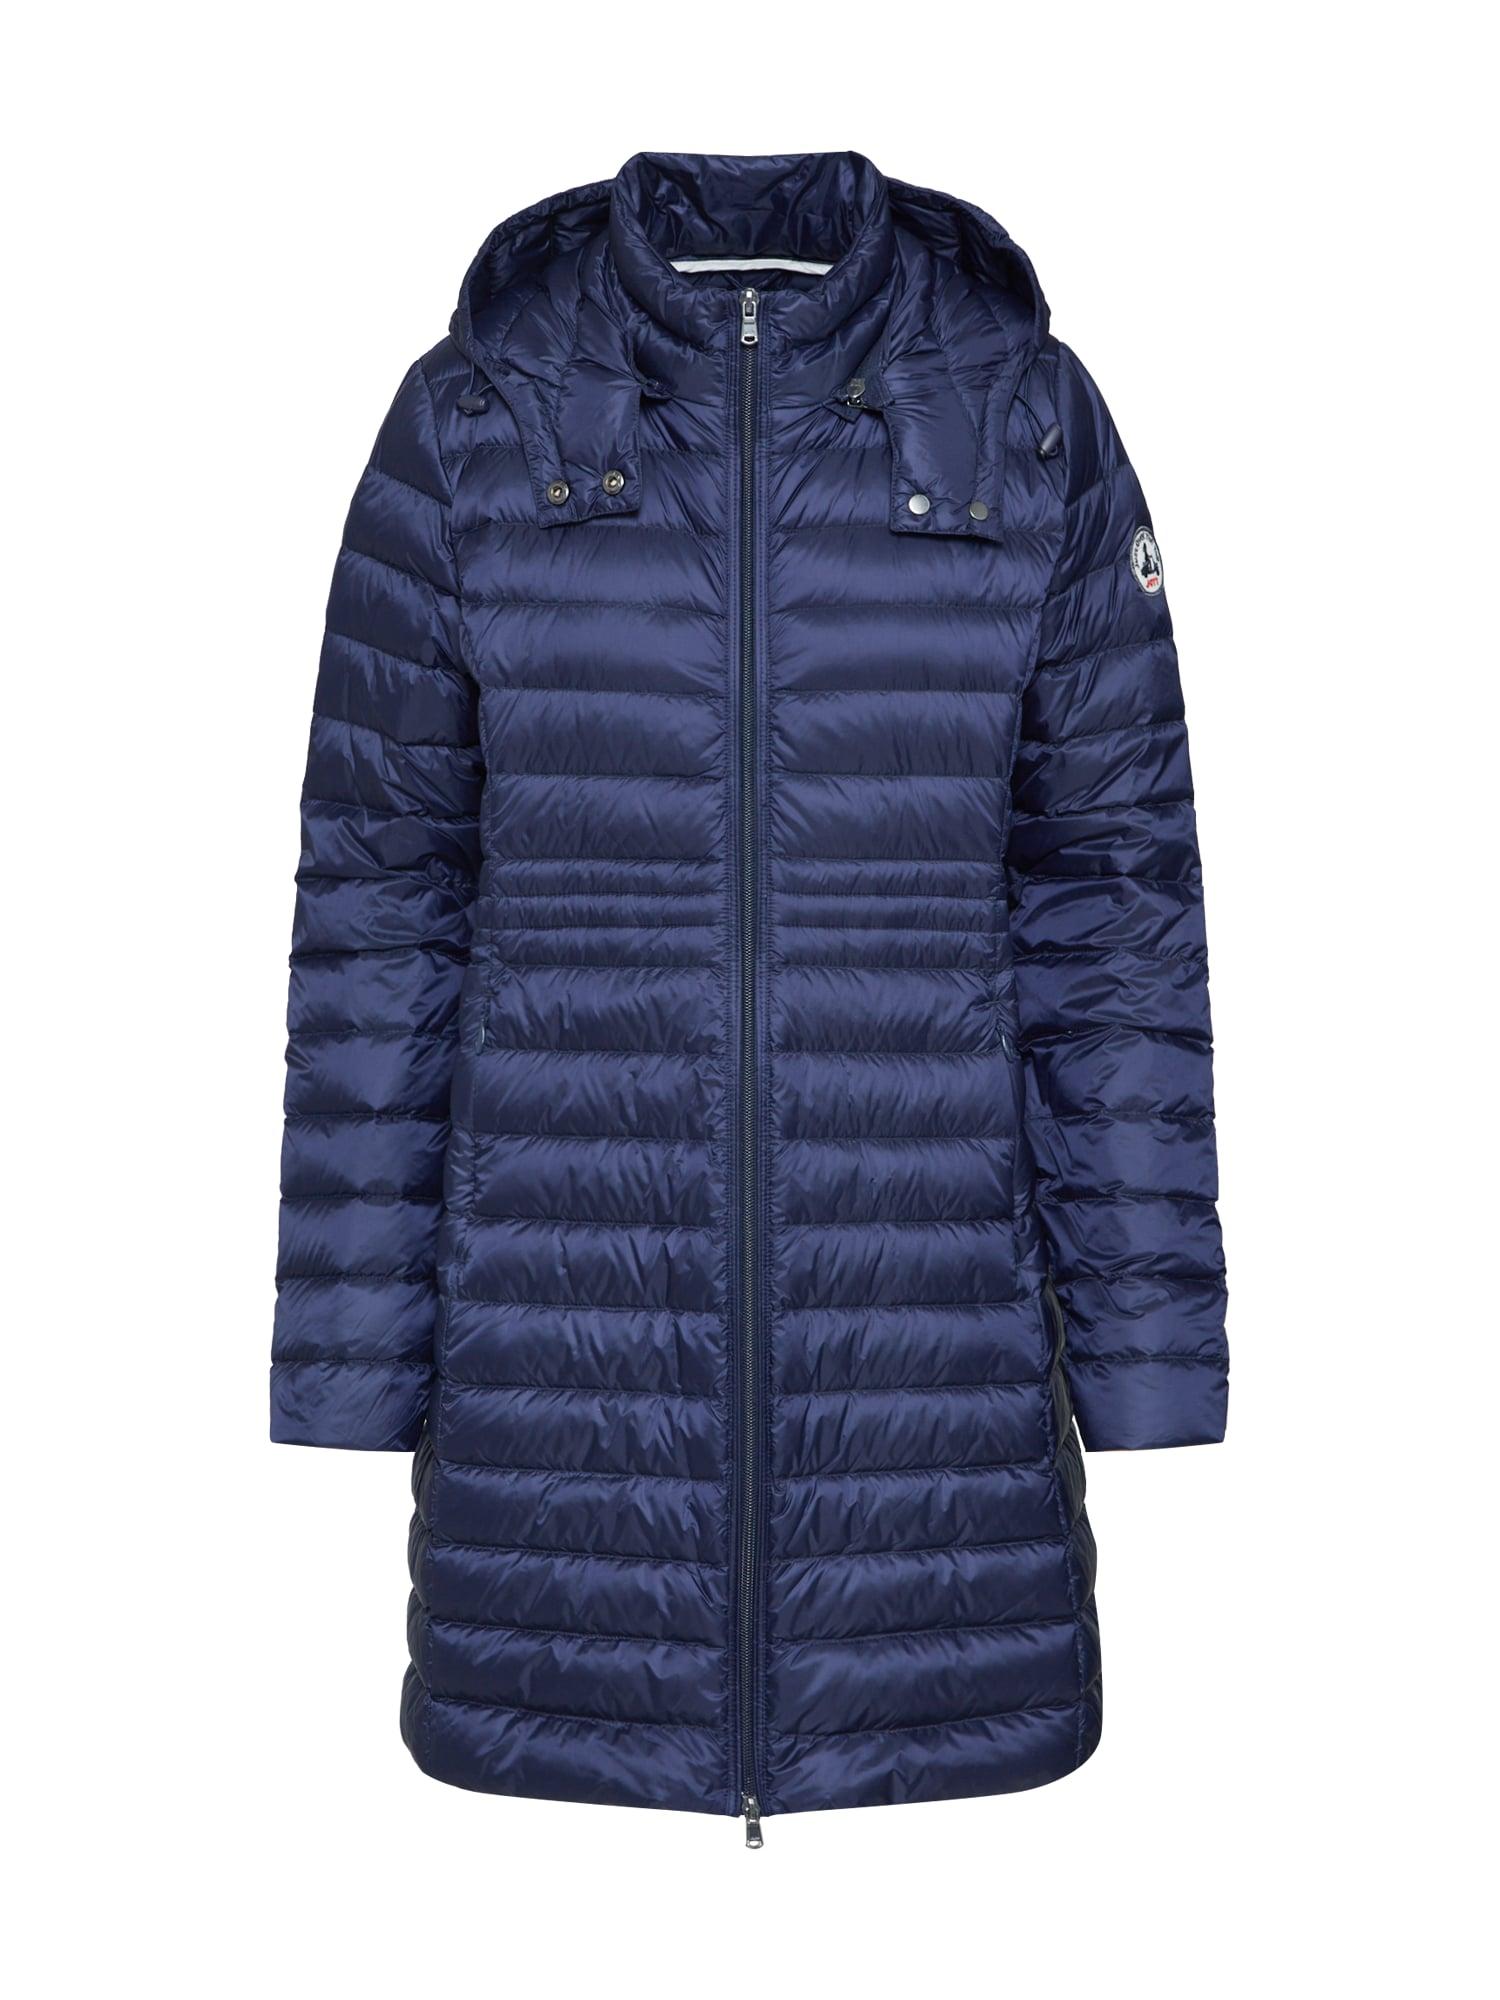 JOTT Žieminis paltas mėlyna